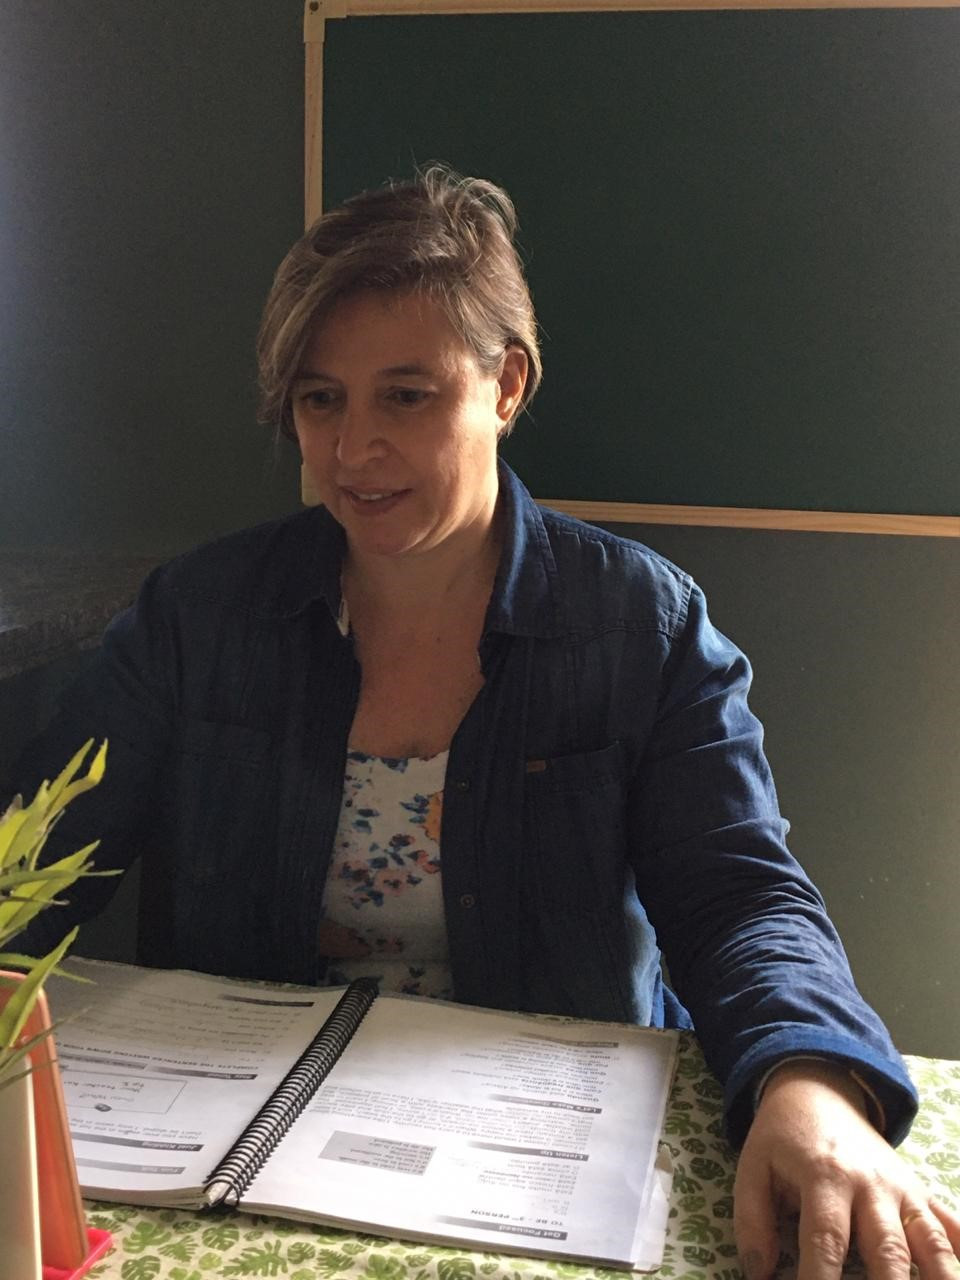 Desde o início da pandemia, Cristina ministra on-line o curso Real Time English